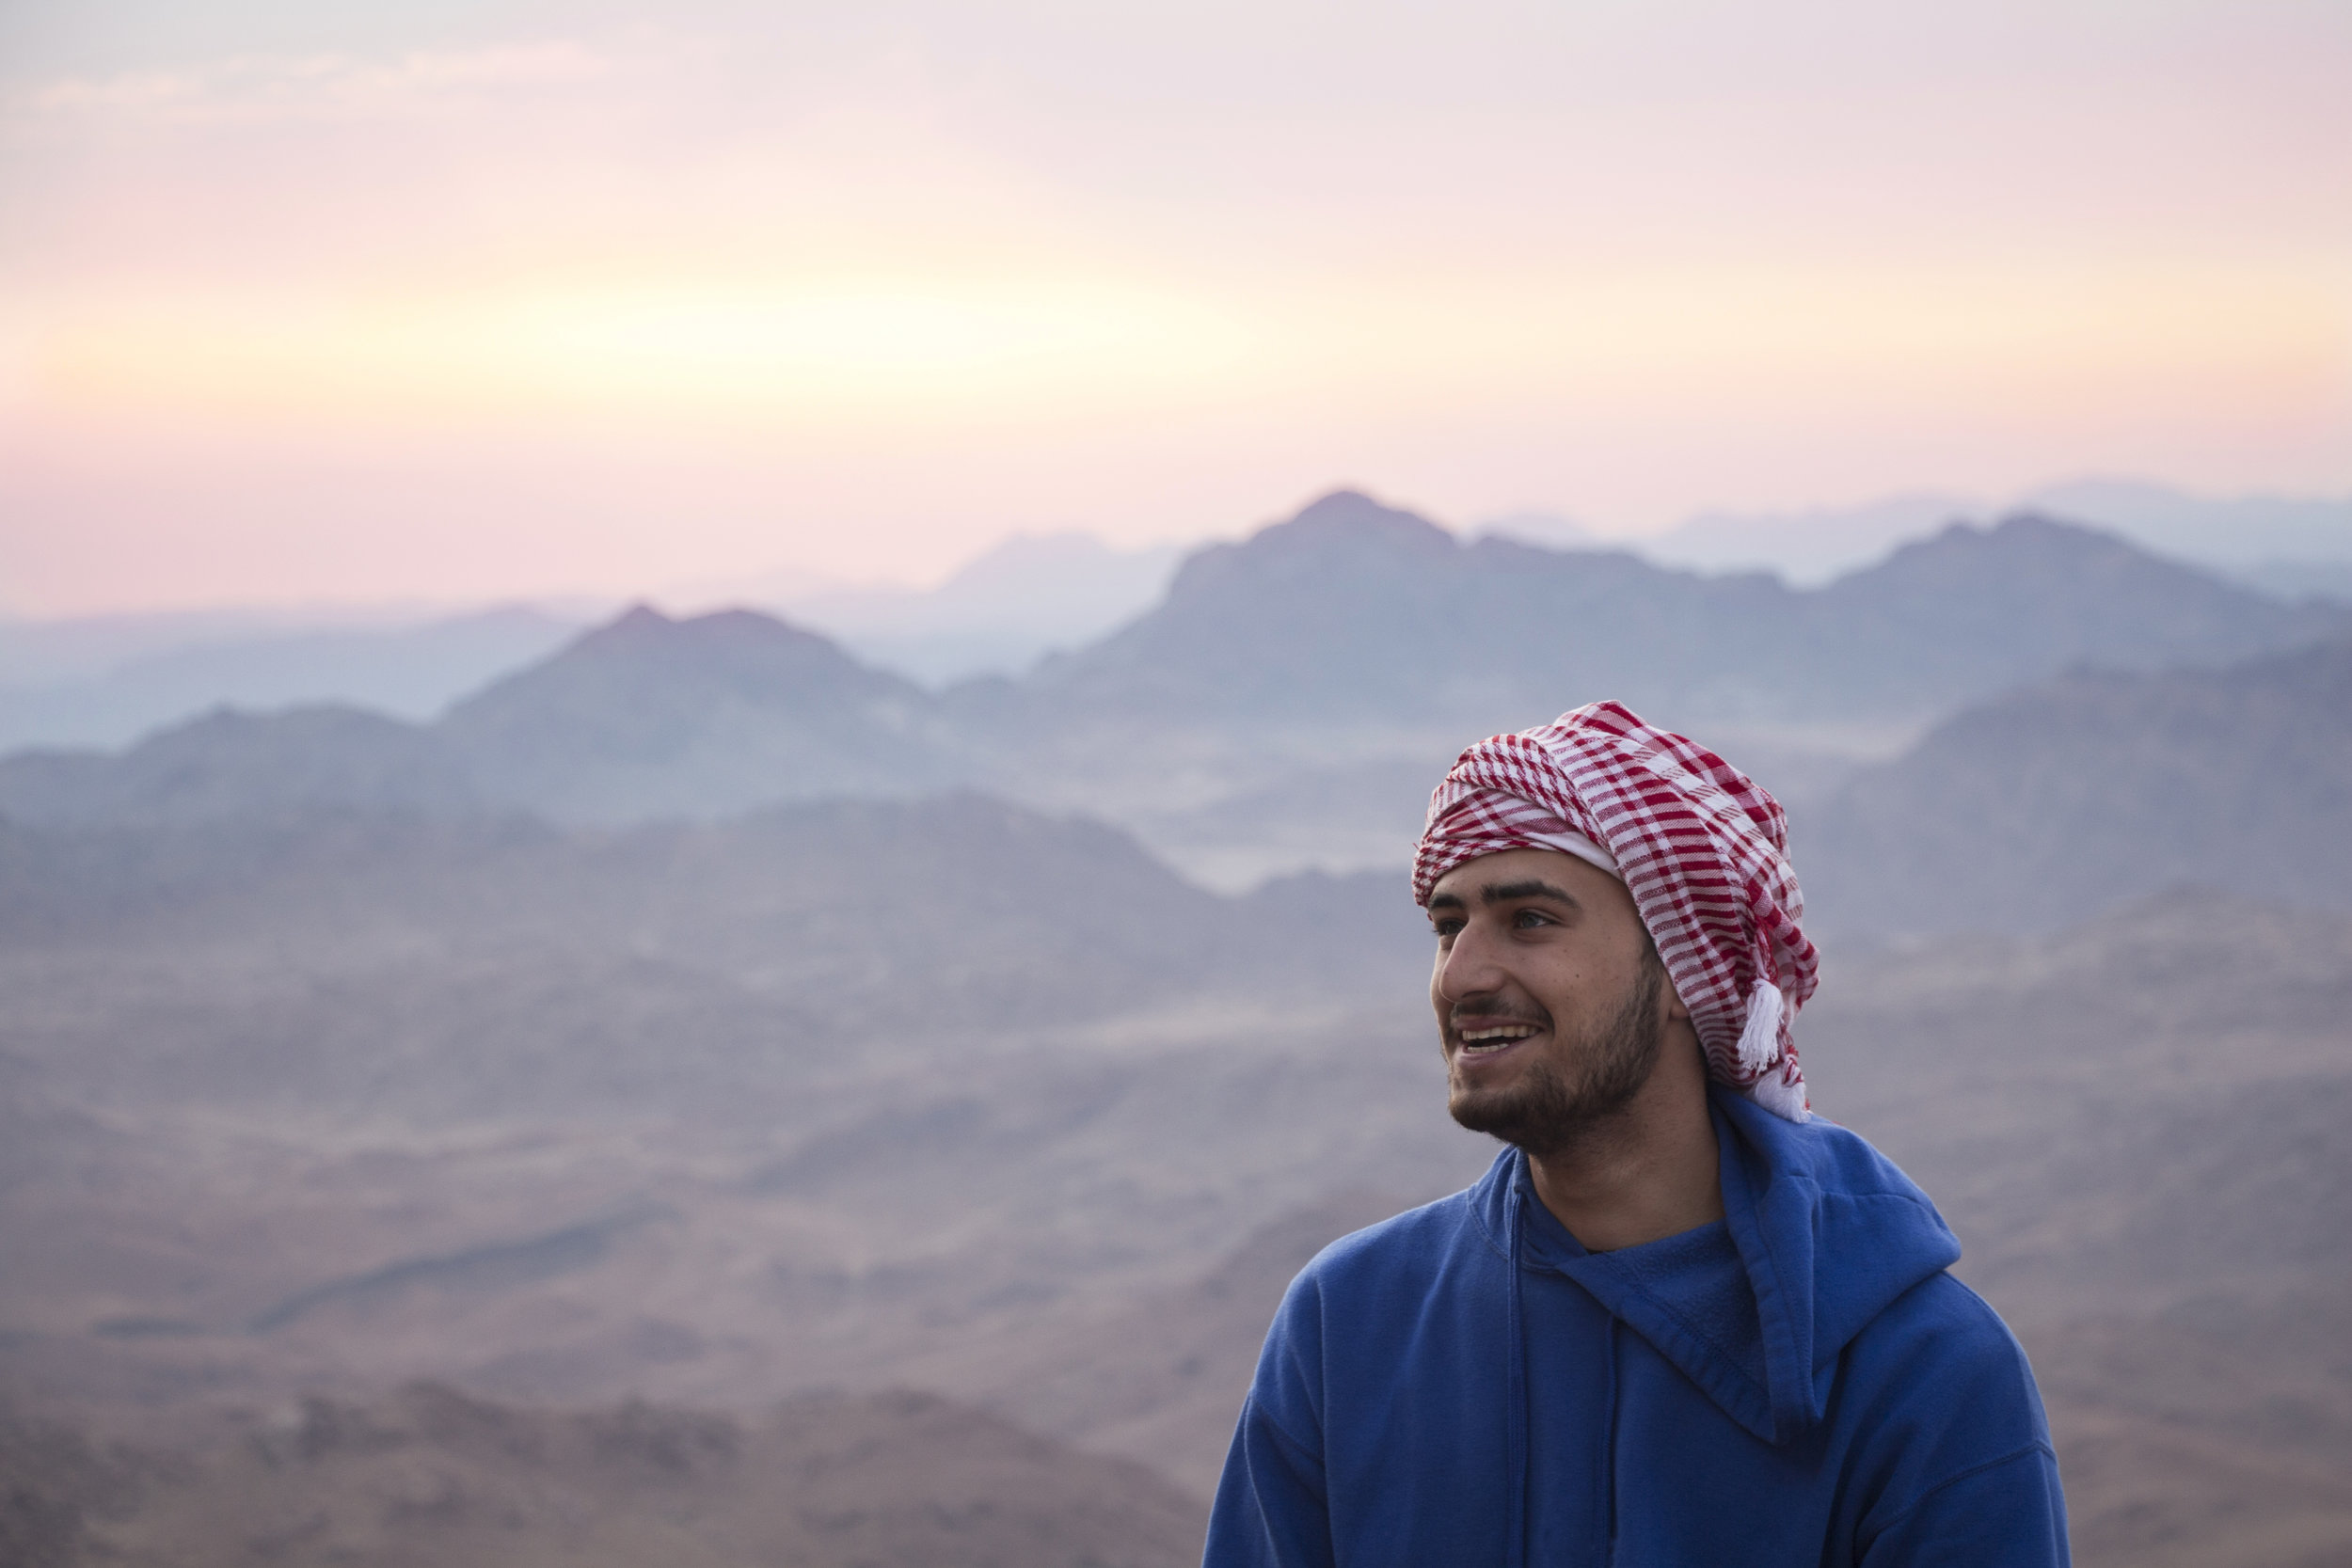 Oriol Paya (Catalonia/Spain) Summit at sunrise on Mount Sinai, Egypt. 18th of August 2017